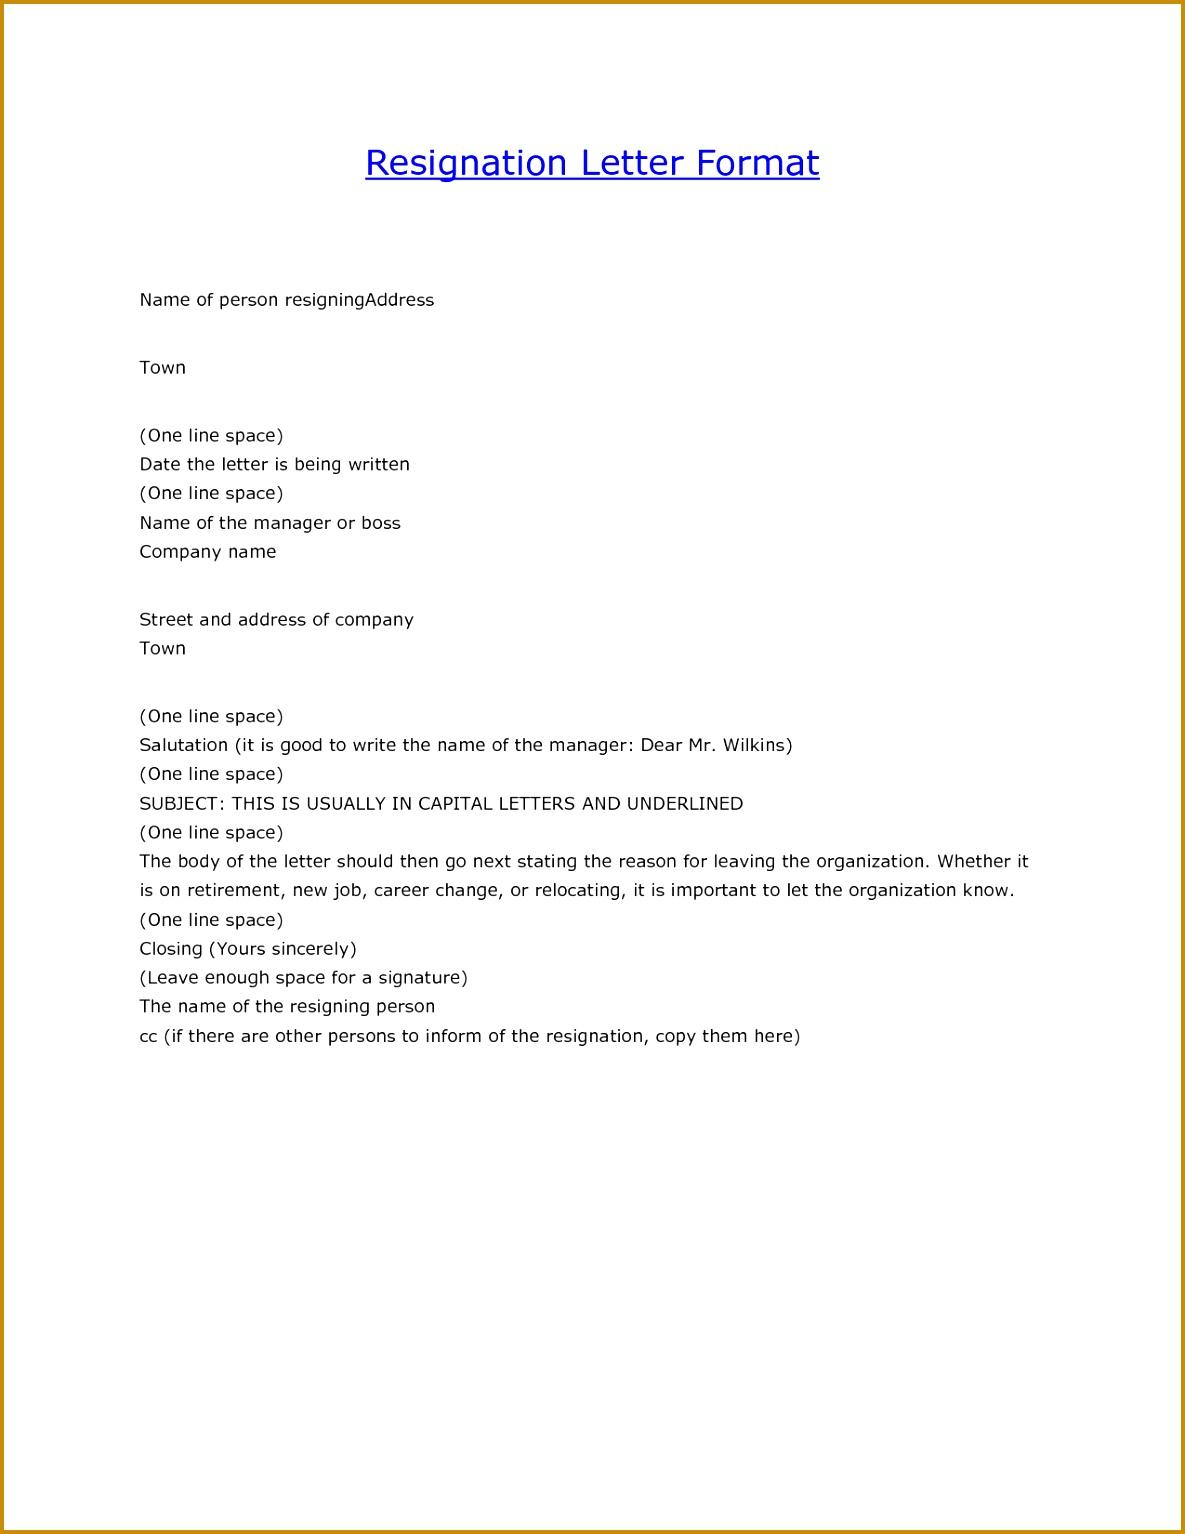 resignation letter format example 15341185